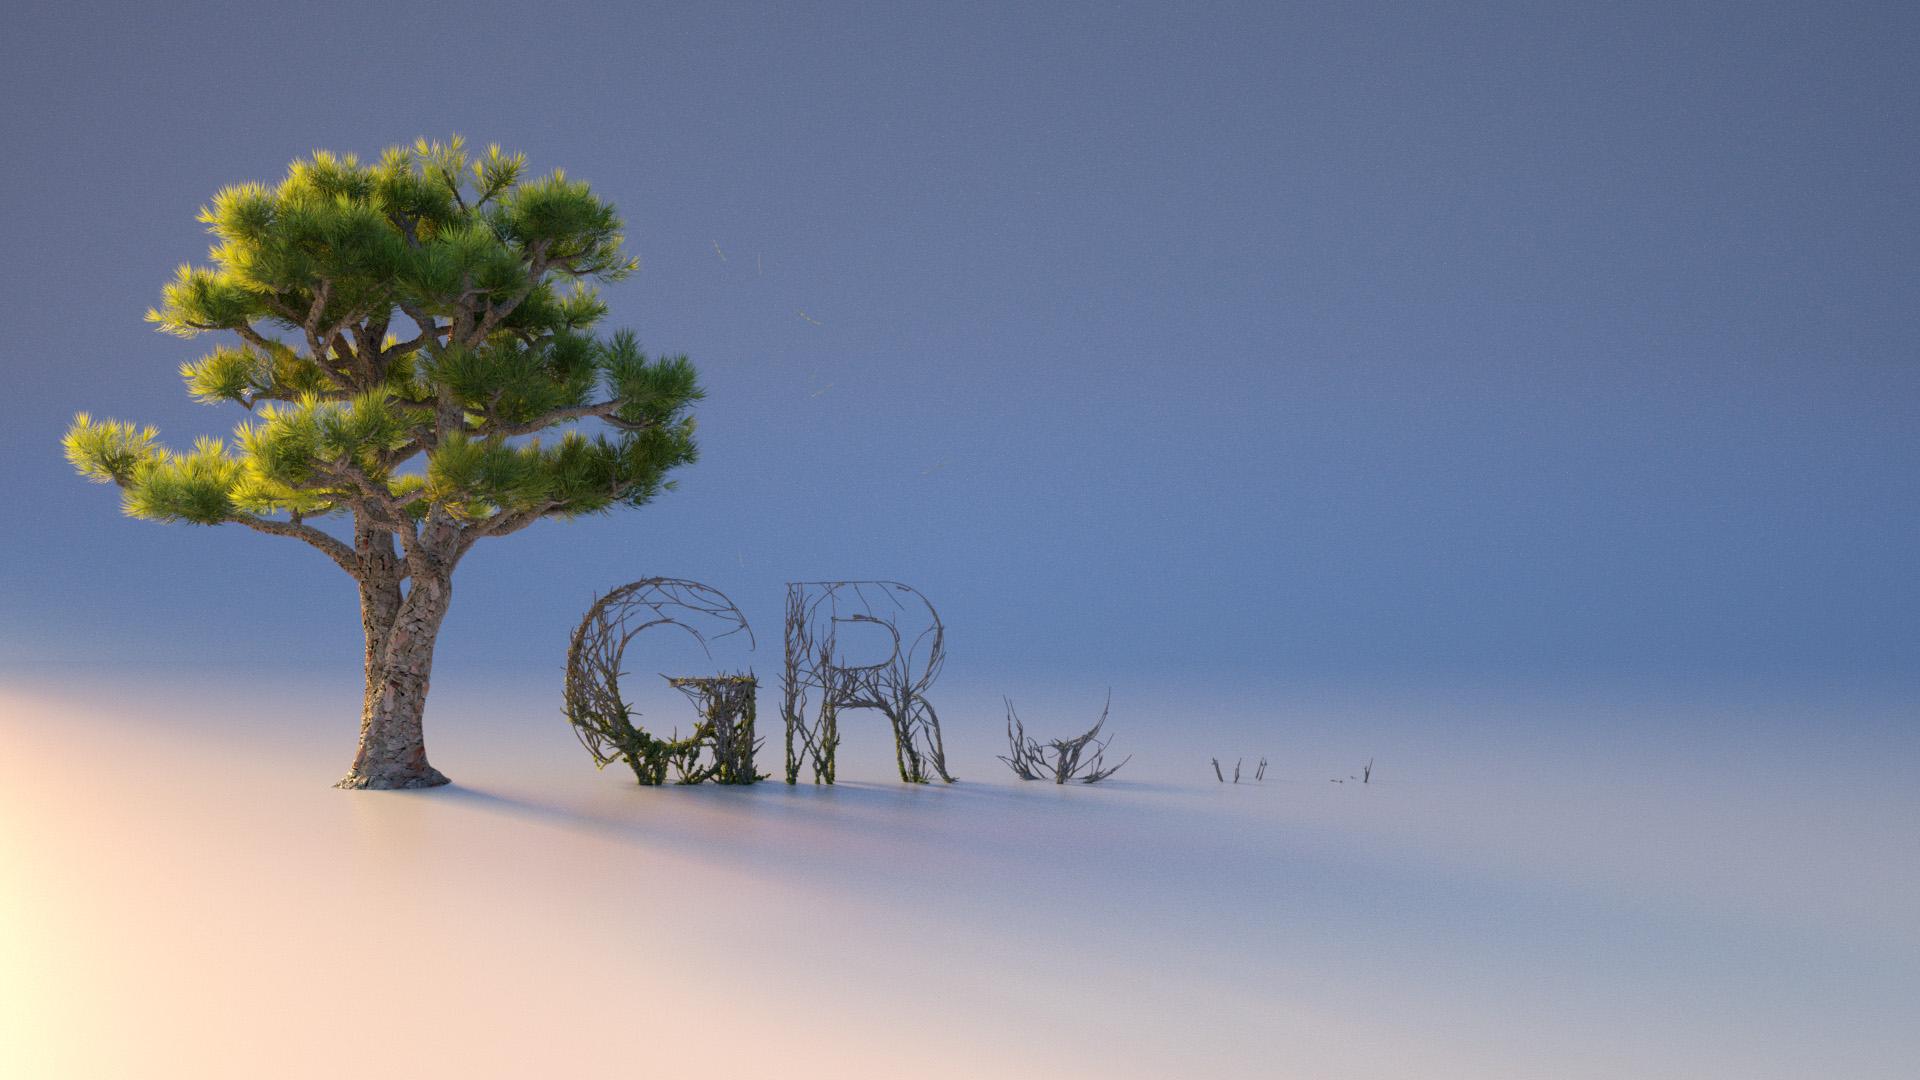 scene01_growth_closeup02 (0-00-02-12).jpg